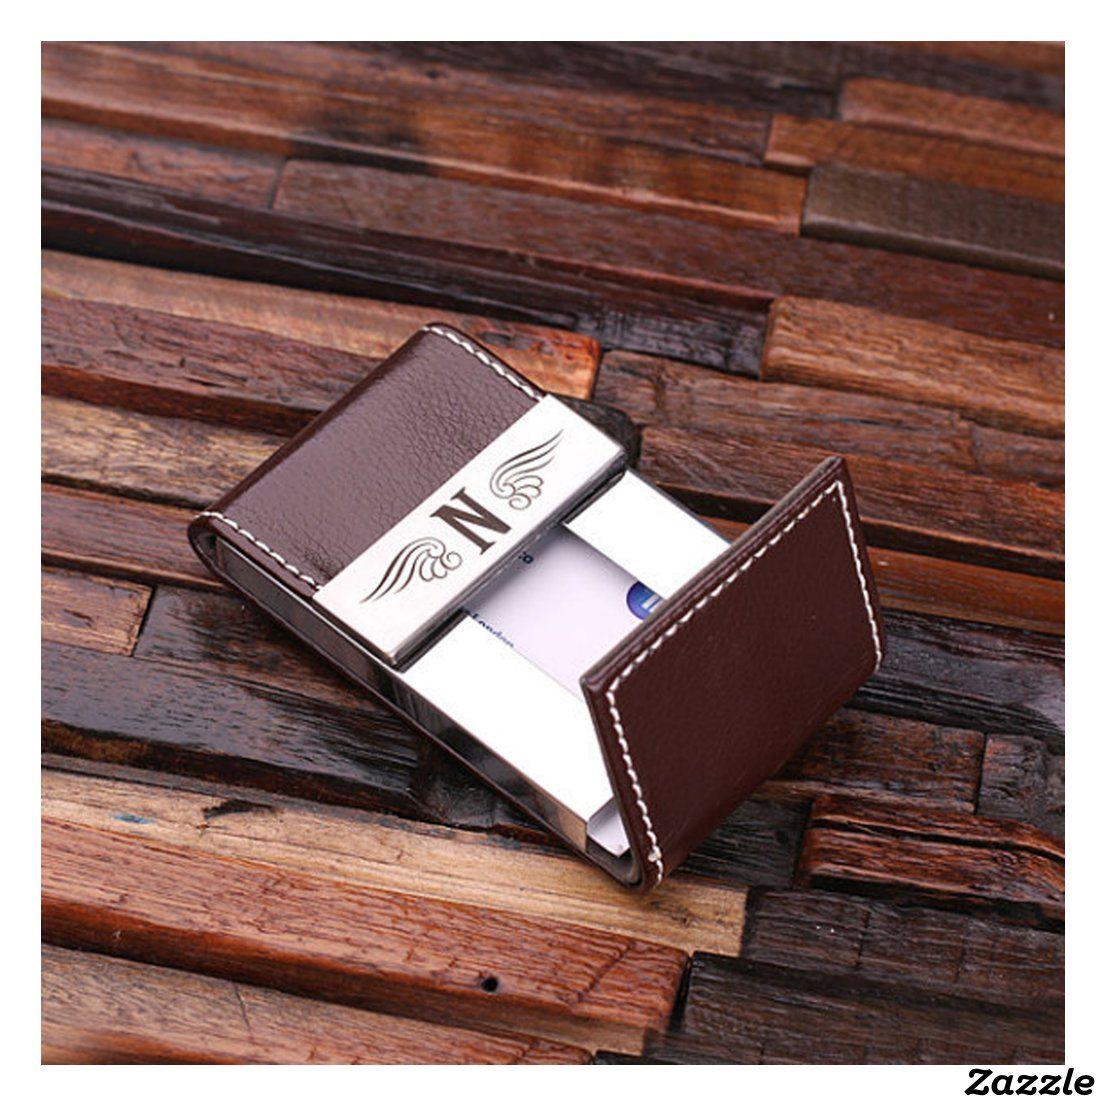 Brown Monogram Leather Business Card Holder Zazzle Com In 2021 Leather Business Card Holder Monogrammed Business Card Holder Leather Business Cards